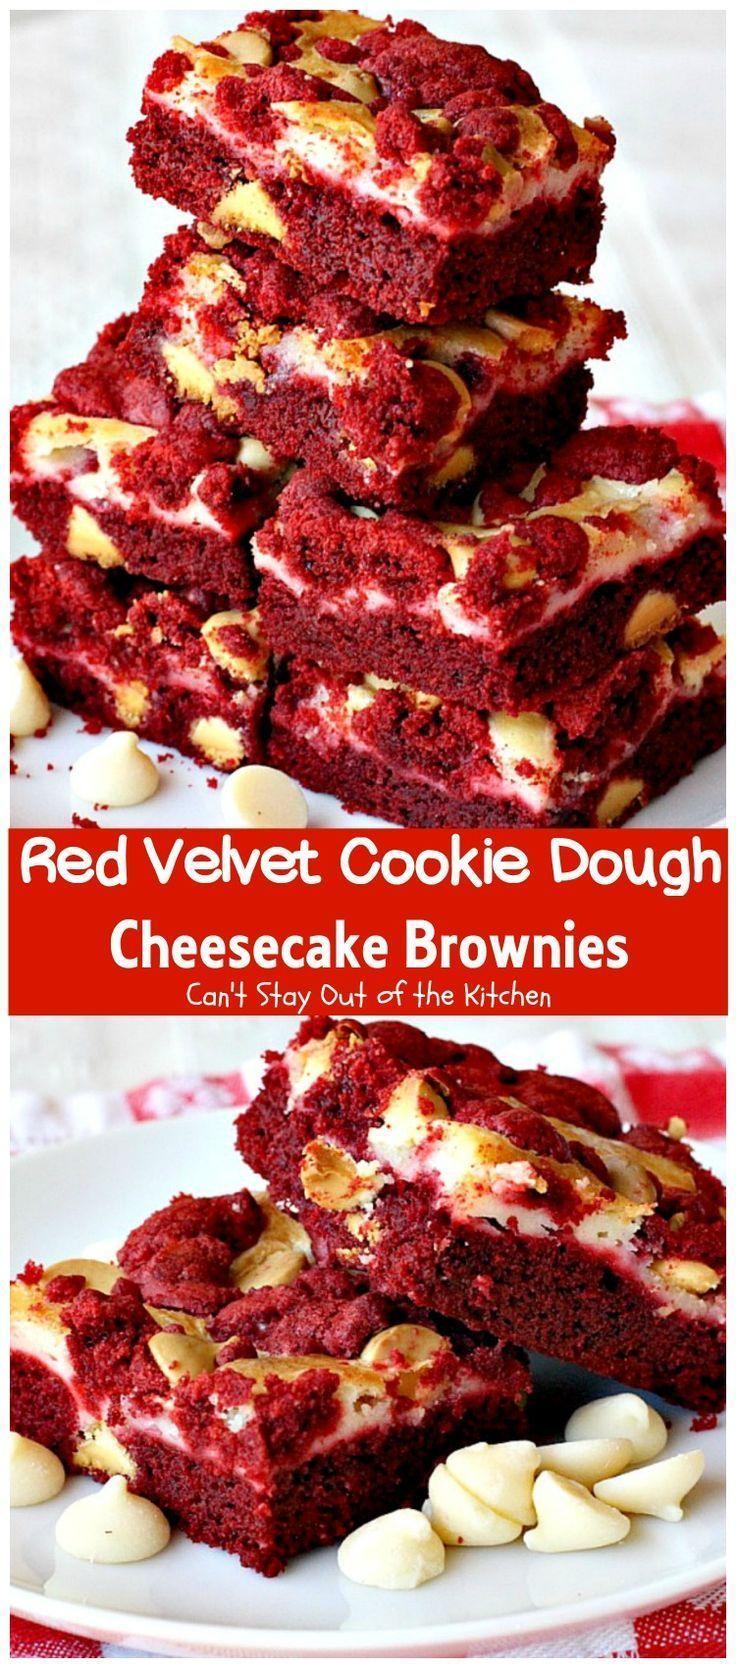 Red Velvet Cookie Dough Cheesecake Brownies- -#Desserts #redvelvetcheesecake